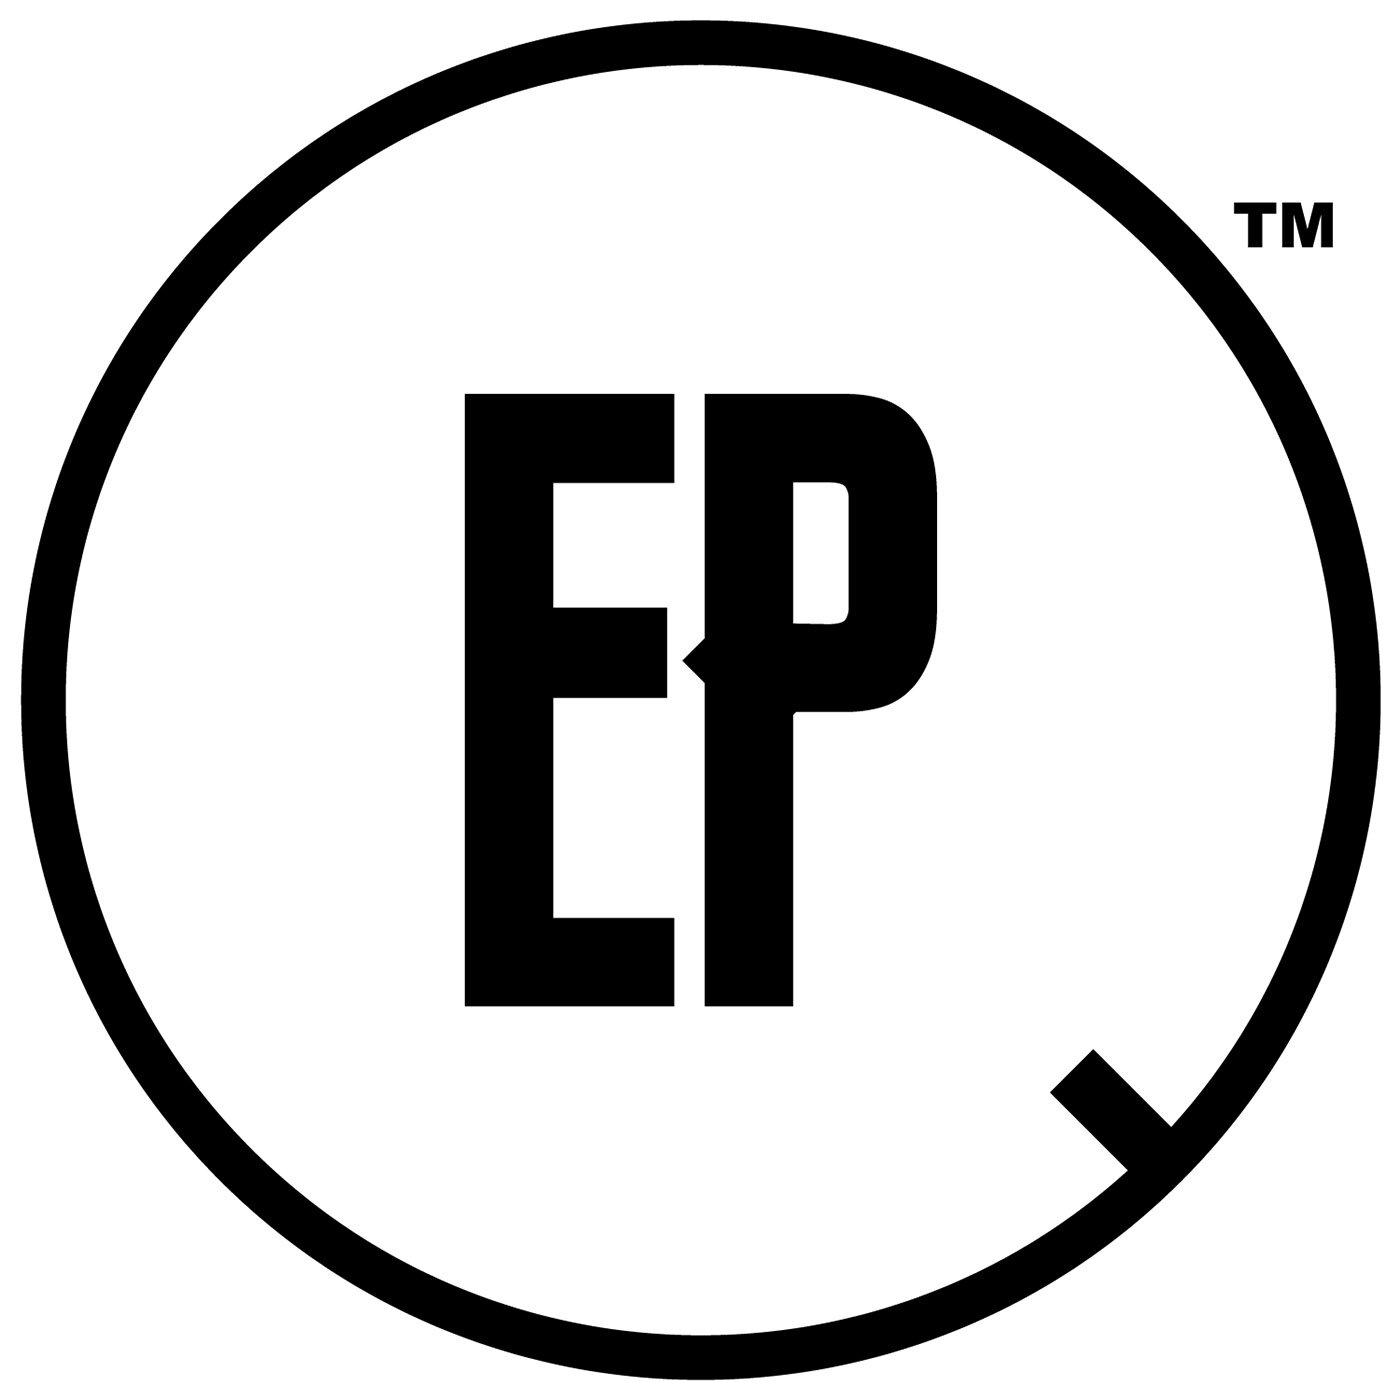 enterprise_podcasts_logo_black_v2.jpg